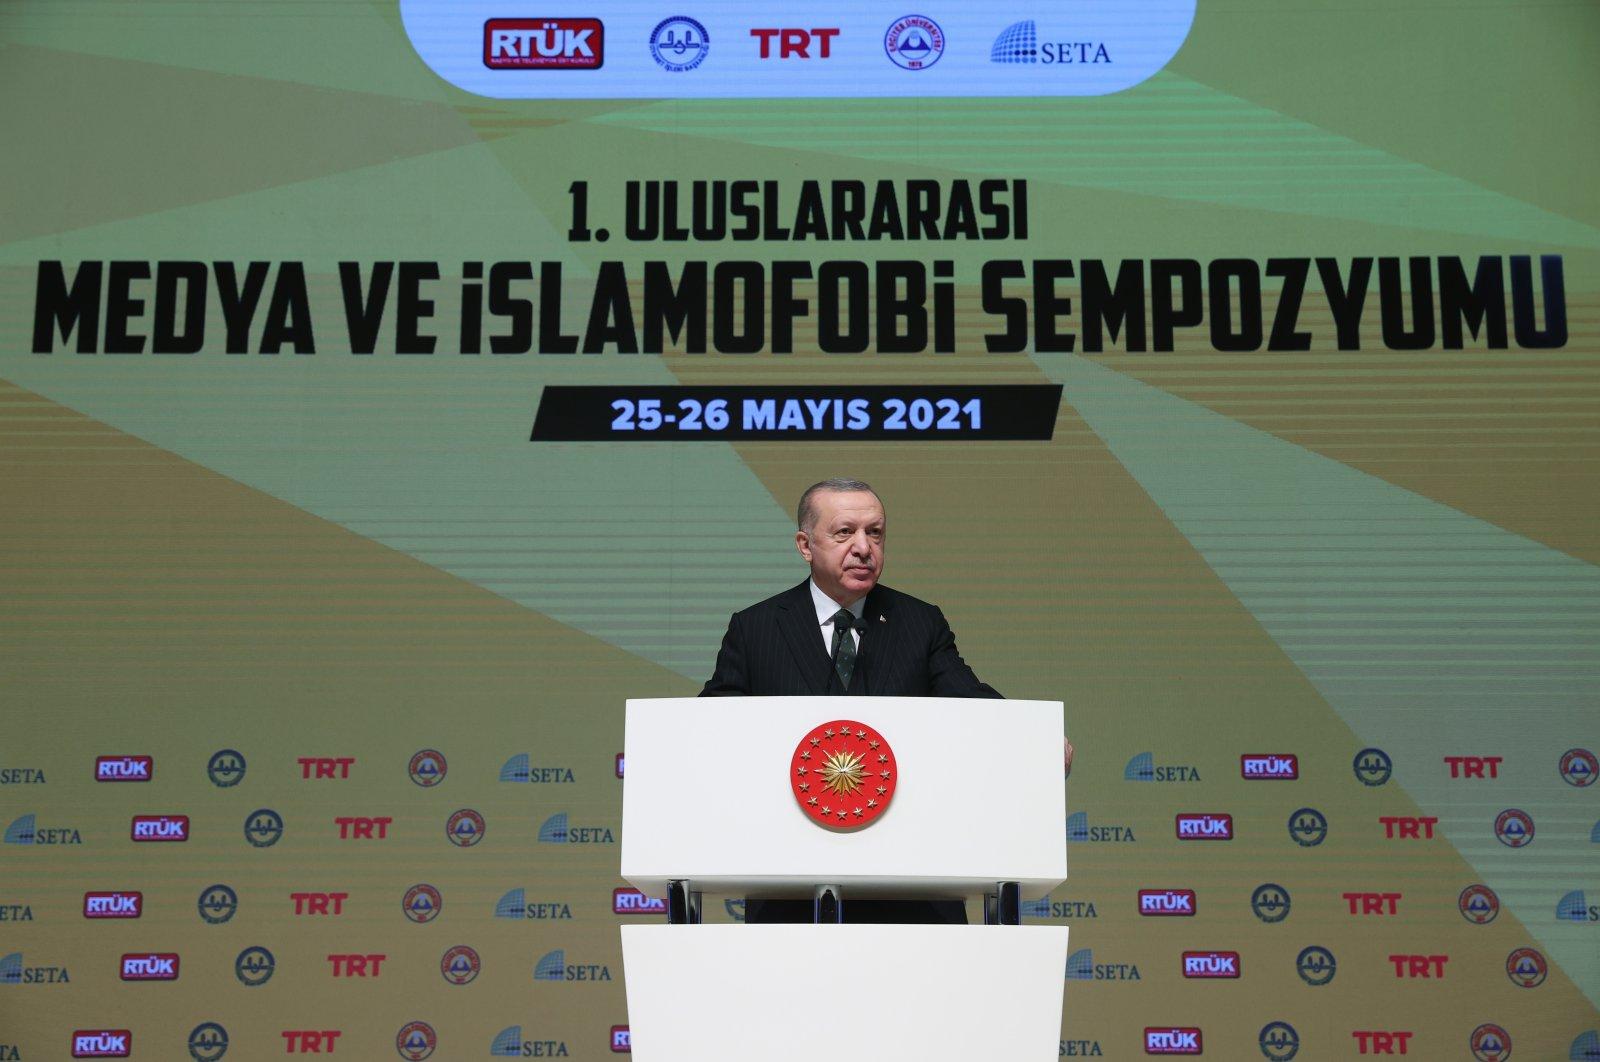 President Recep Tayyip Erdoğan speaks at theInternational Symposium on Media and Islamophobia in the capital Ankara, Turkey, May 25, 2021. (AA Photo)